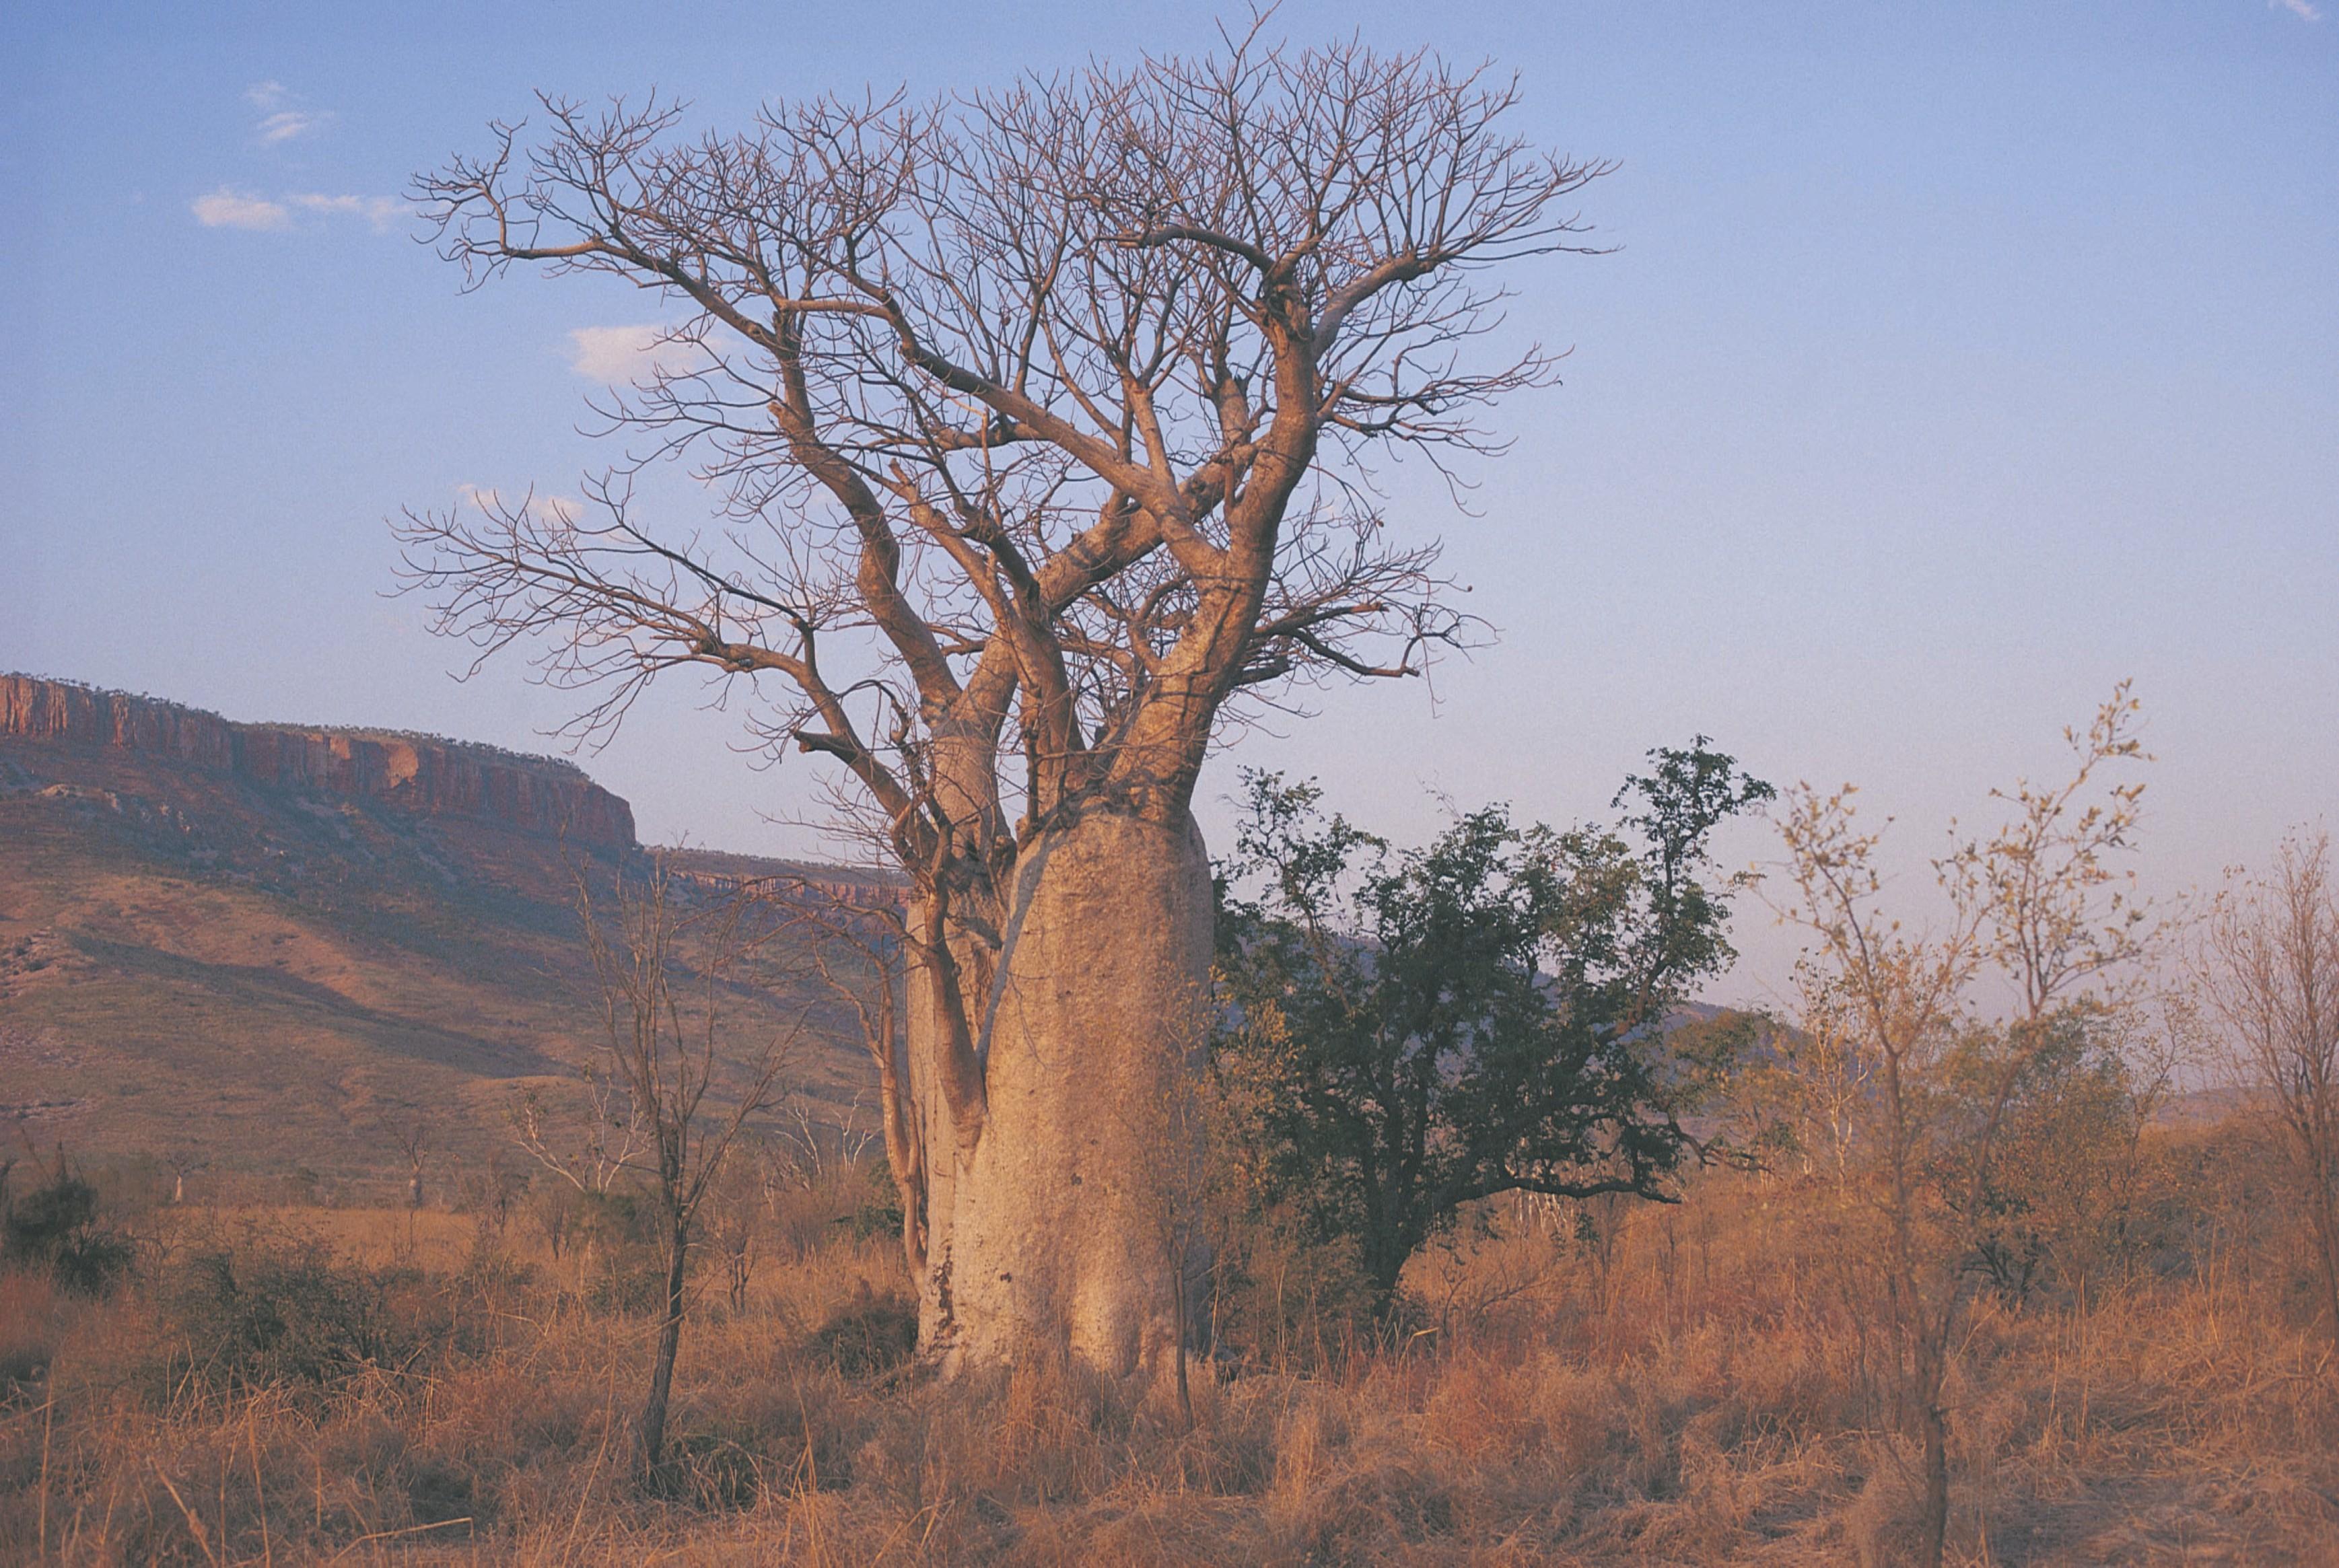 El-Questro-Homestead_Boab tree & Cockburn Range - Click to view larger version